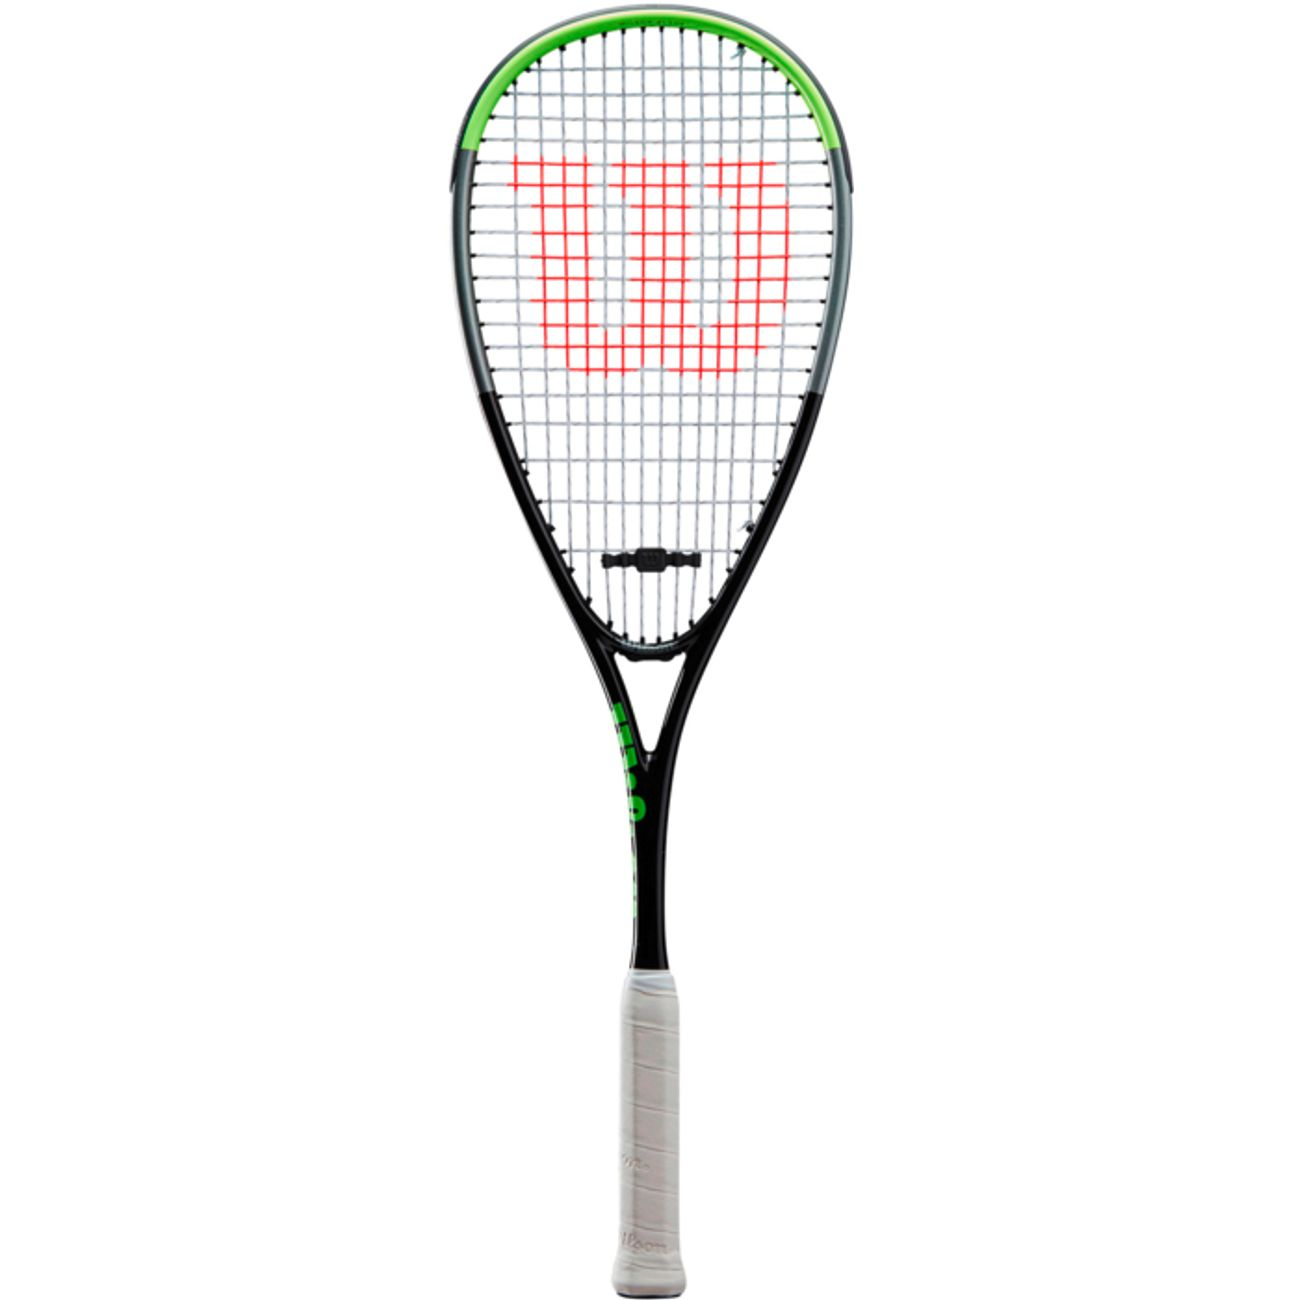 RAQUETTE Squash mixte WILSON BLADE TEAM